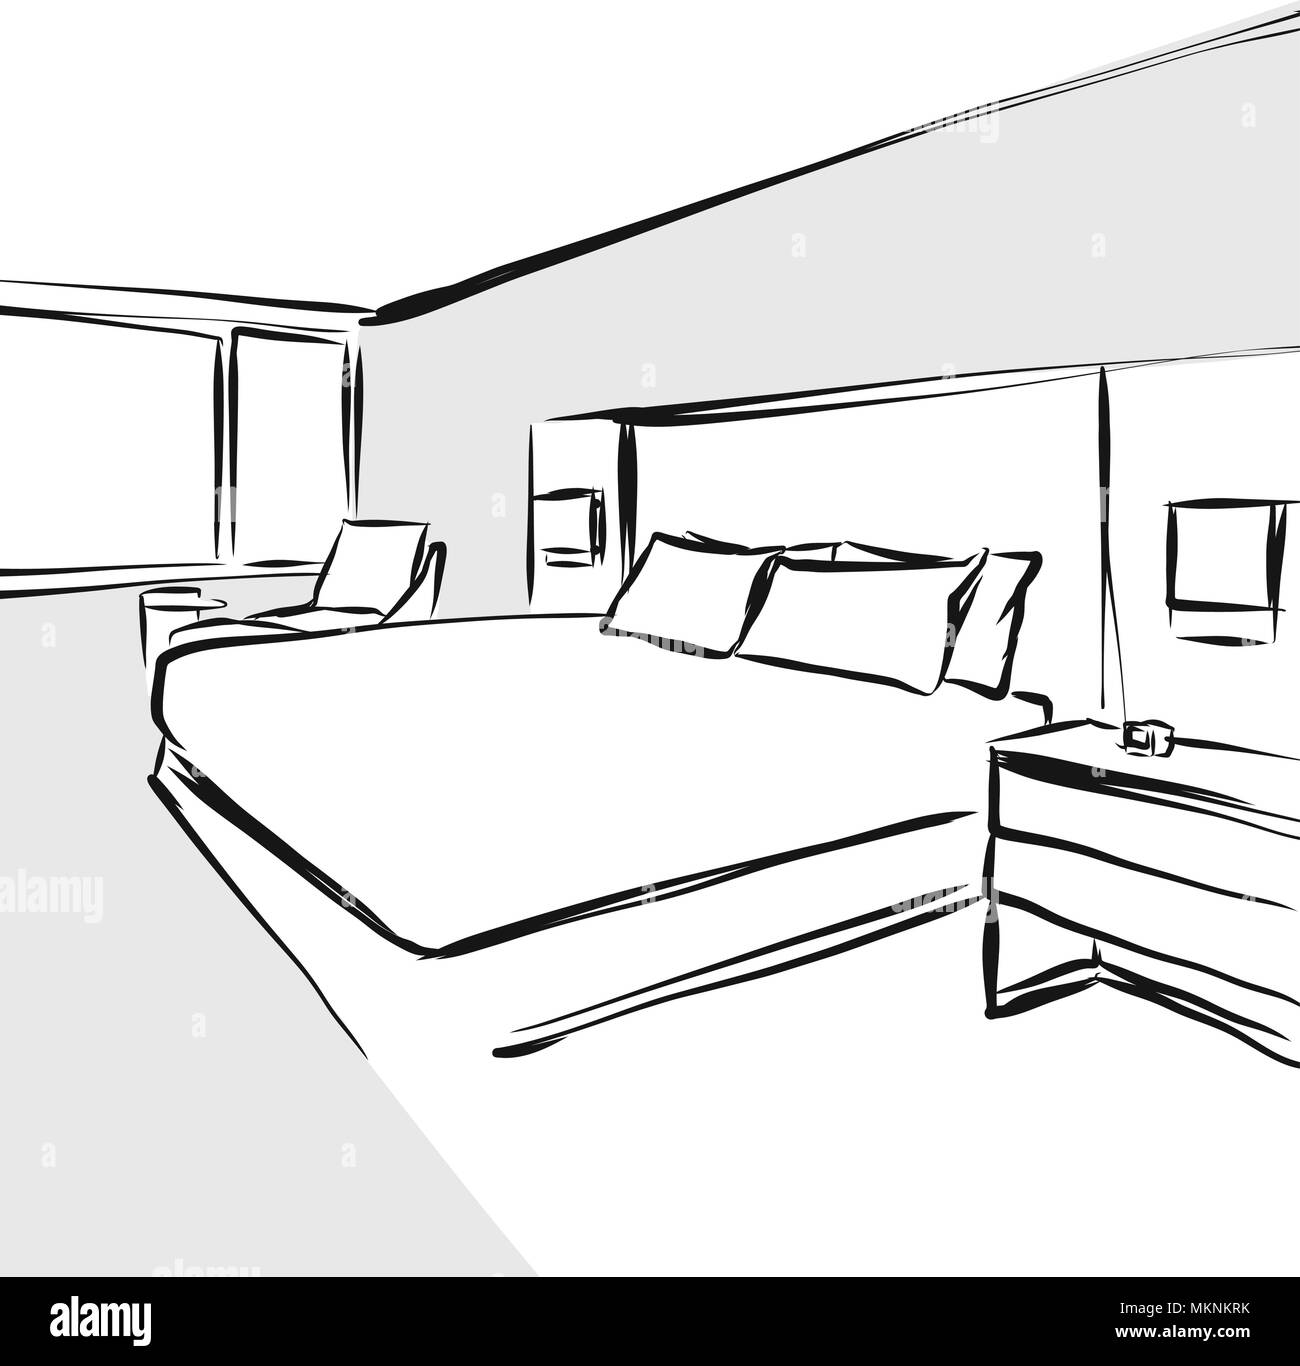 Interior Design Line Art Vector : Bedroom interior design concept drawing hand drawn vector